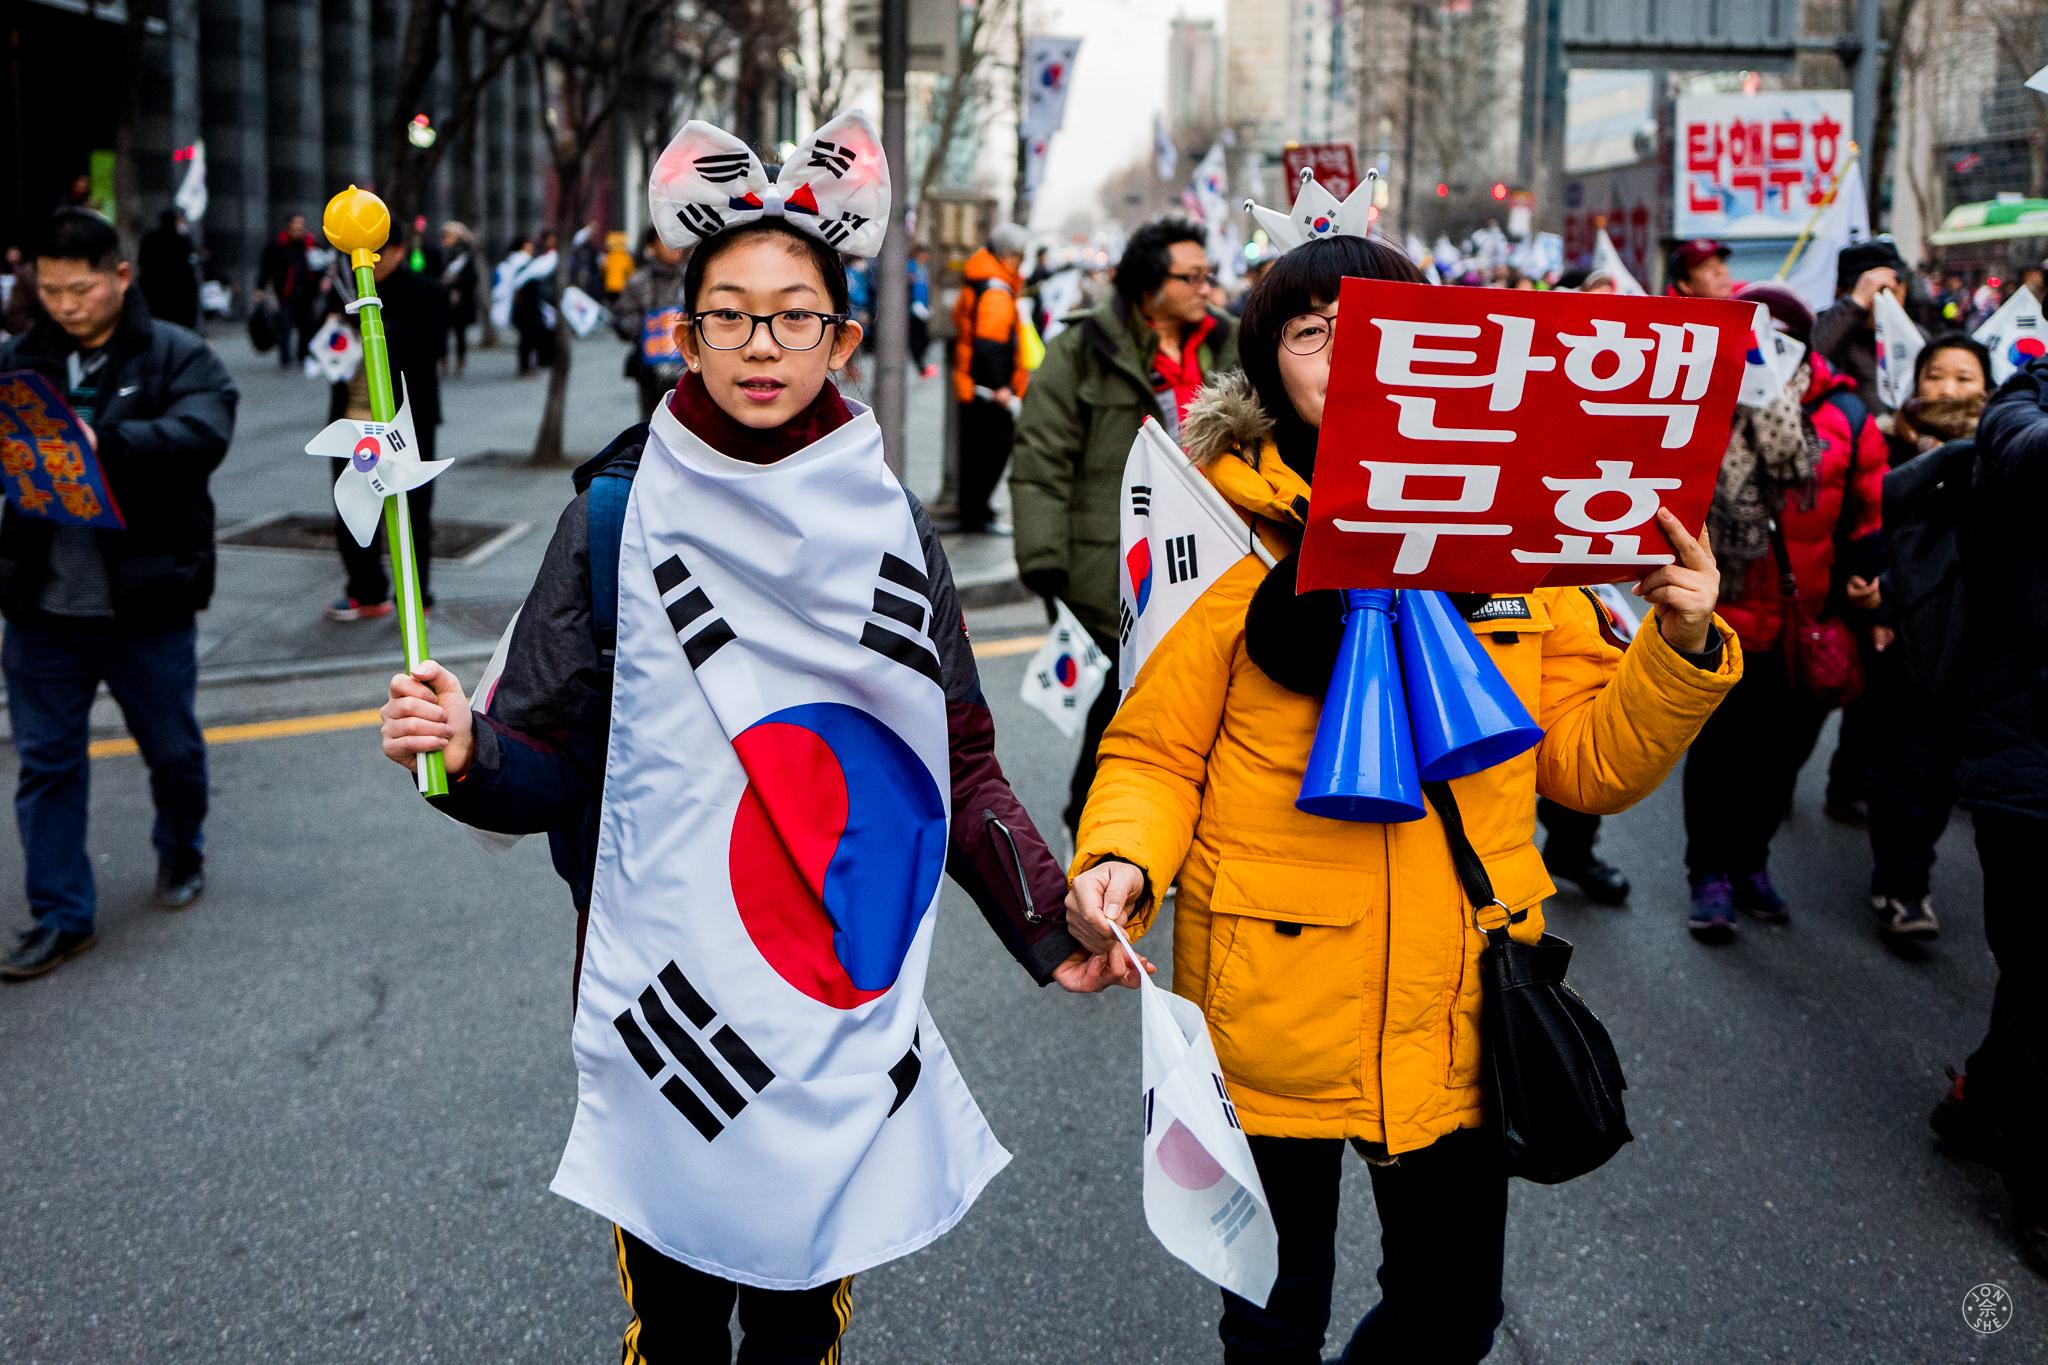 """Gangnam Carnivale (3)"". Peaceful demonstrations appear to take the place of a festive Carnivale in Seoul.Seoul, South Korea. January 2017. © Jon She. Leica Q (Typ 116), Leica Summilux 28mm f/1.7 ASPH (FLE)."